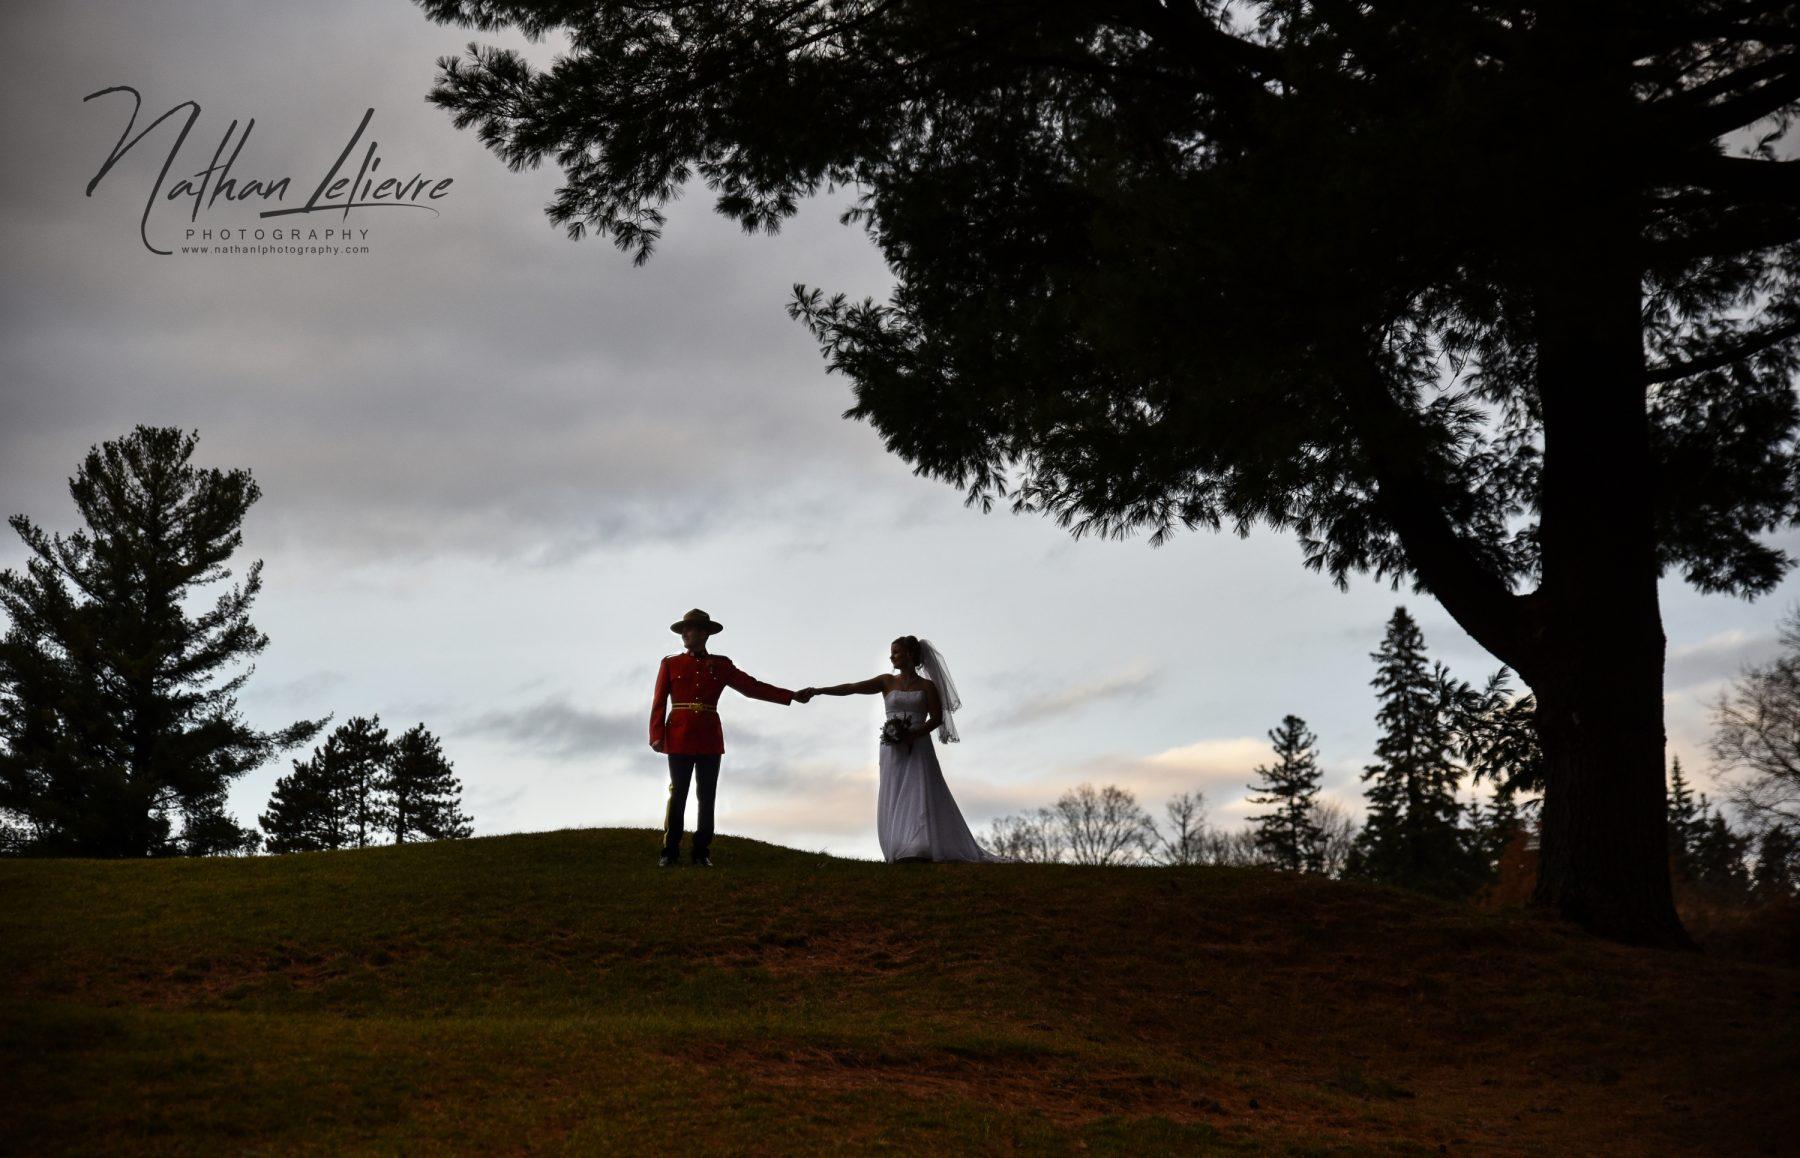 Royal Ottawa Wedding Photo in Ottawa